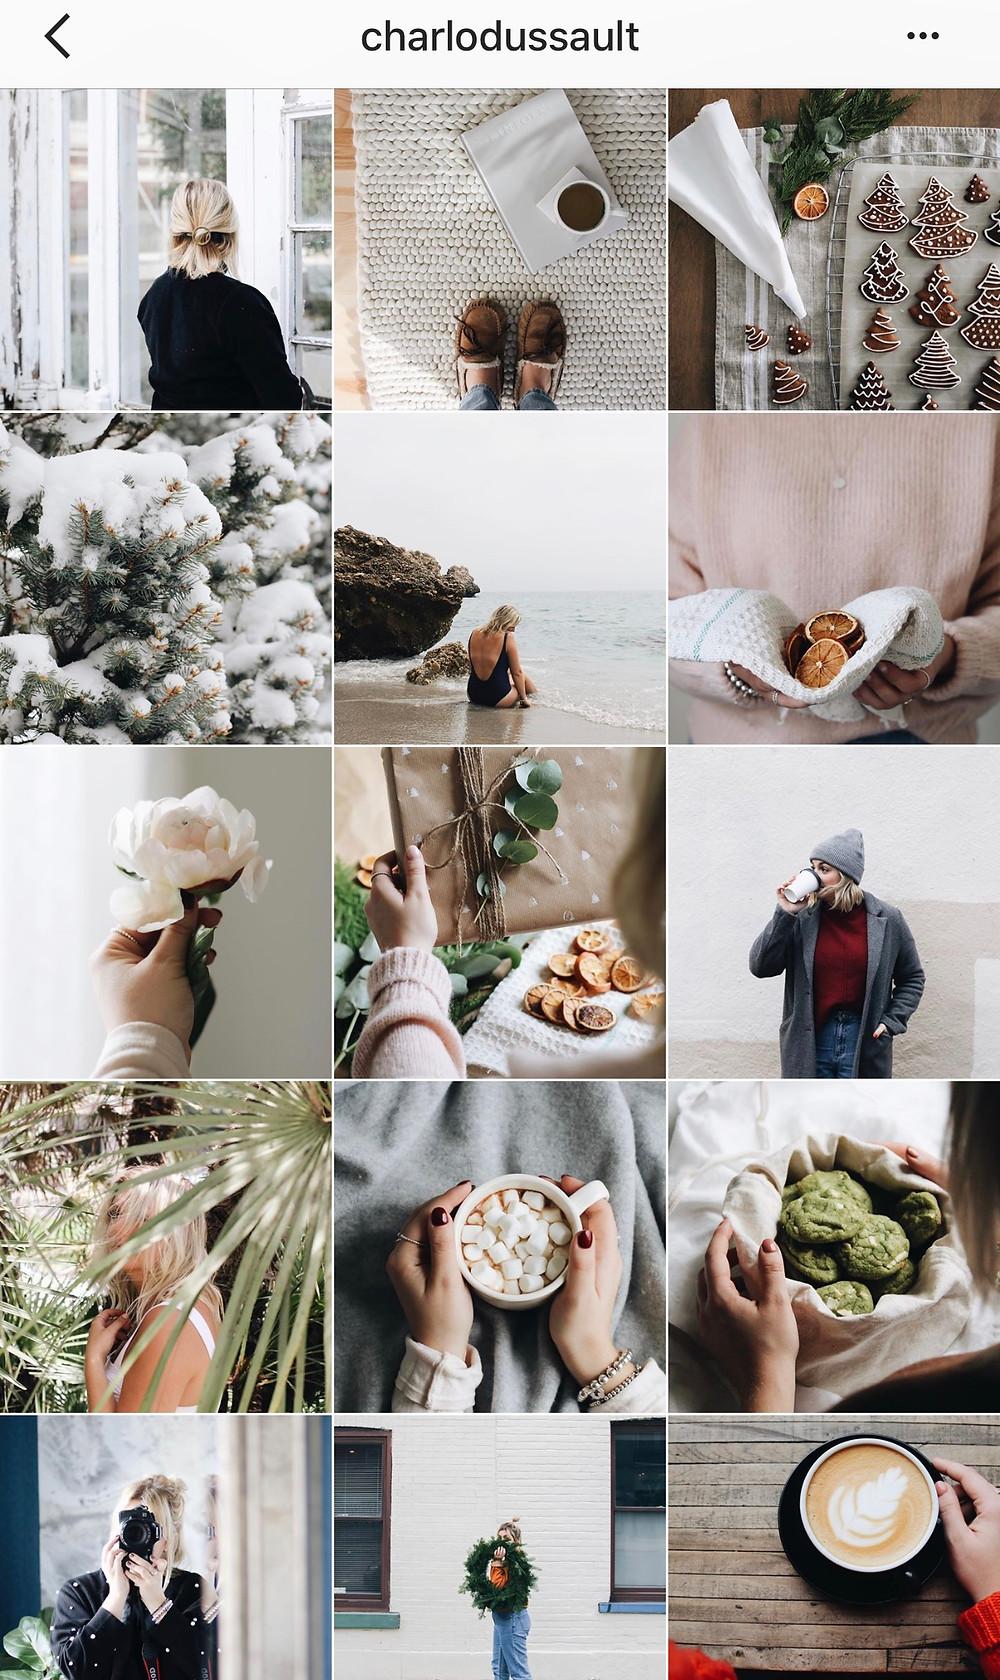 Charlodusseault sur Instagram